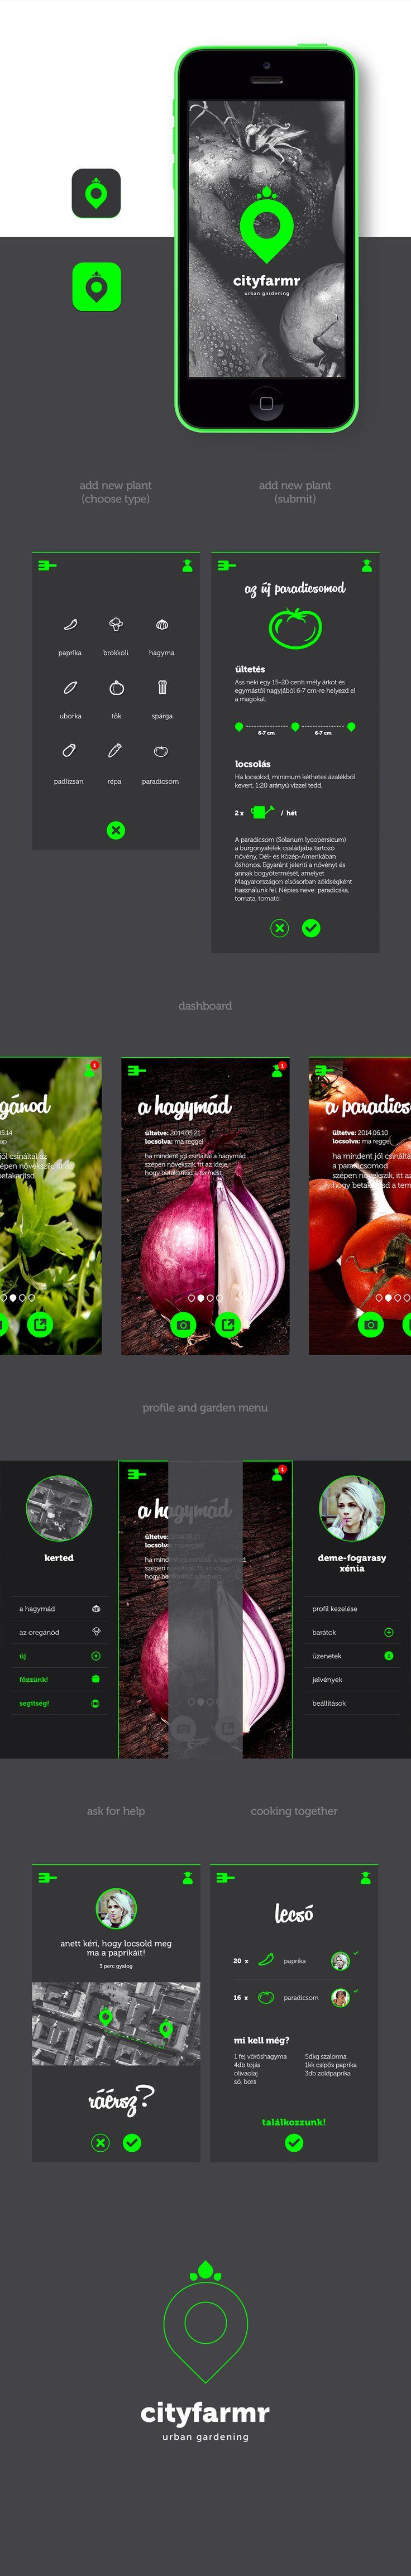 Cityfarmr - urban gardening app branding and UI concept